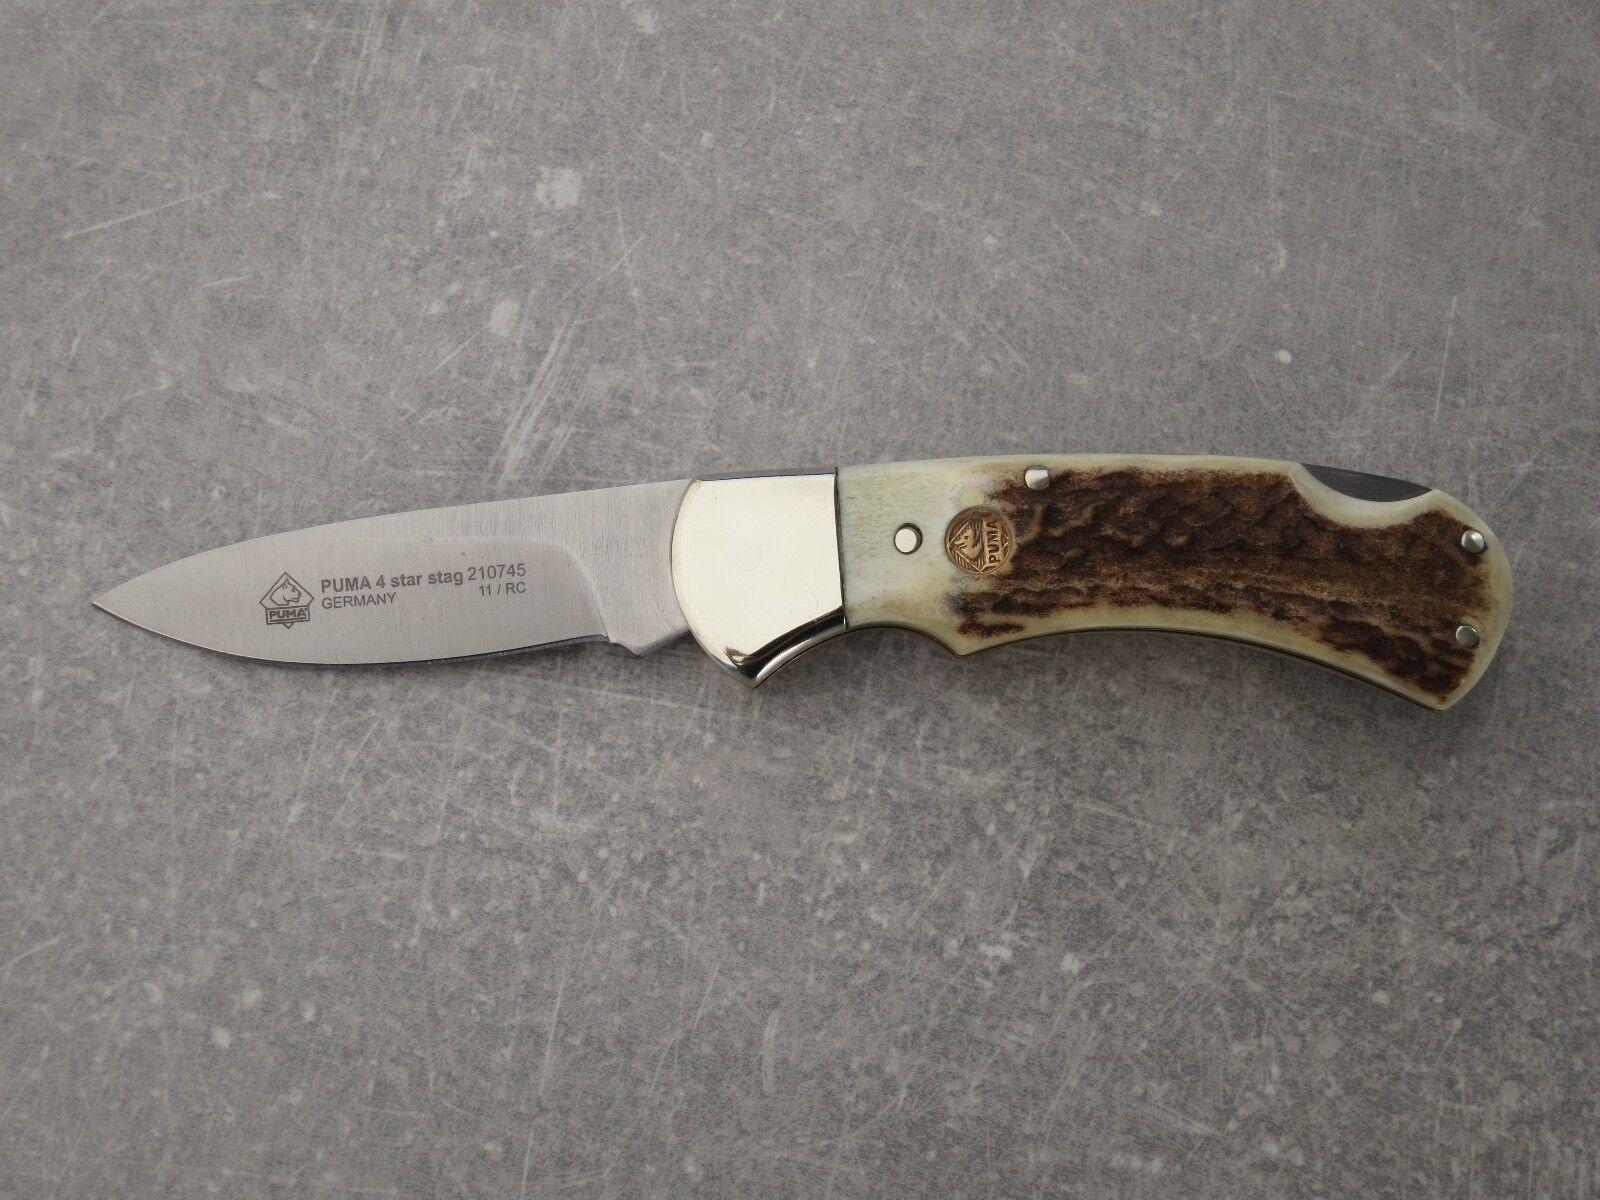 Puma 4 Star Stag, couteau de poche, Hirschhorn, sans NEUF dans dans NEUF sa  boîte d43386 7974dcfbedb